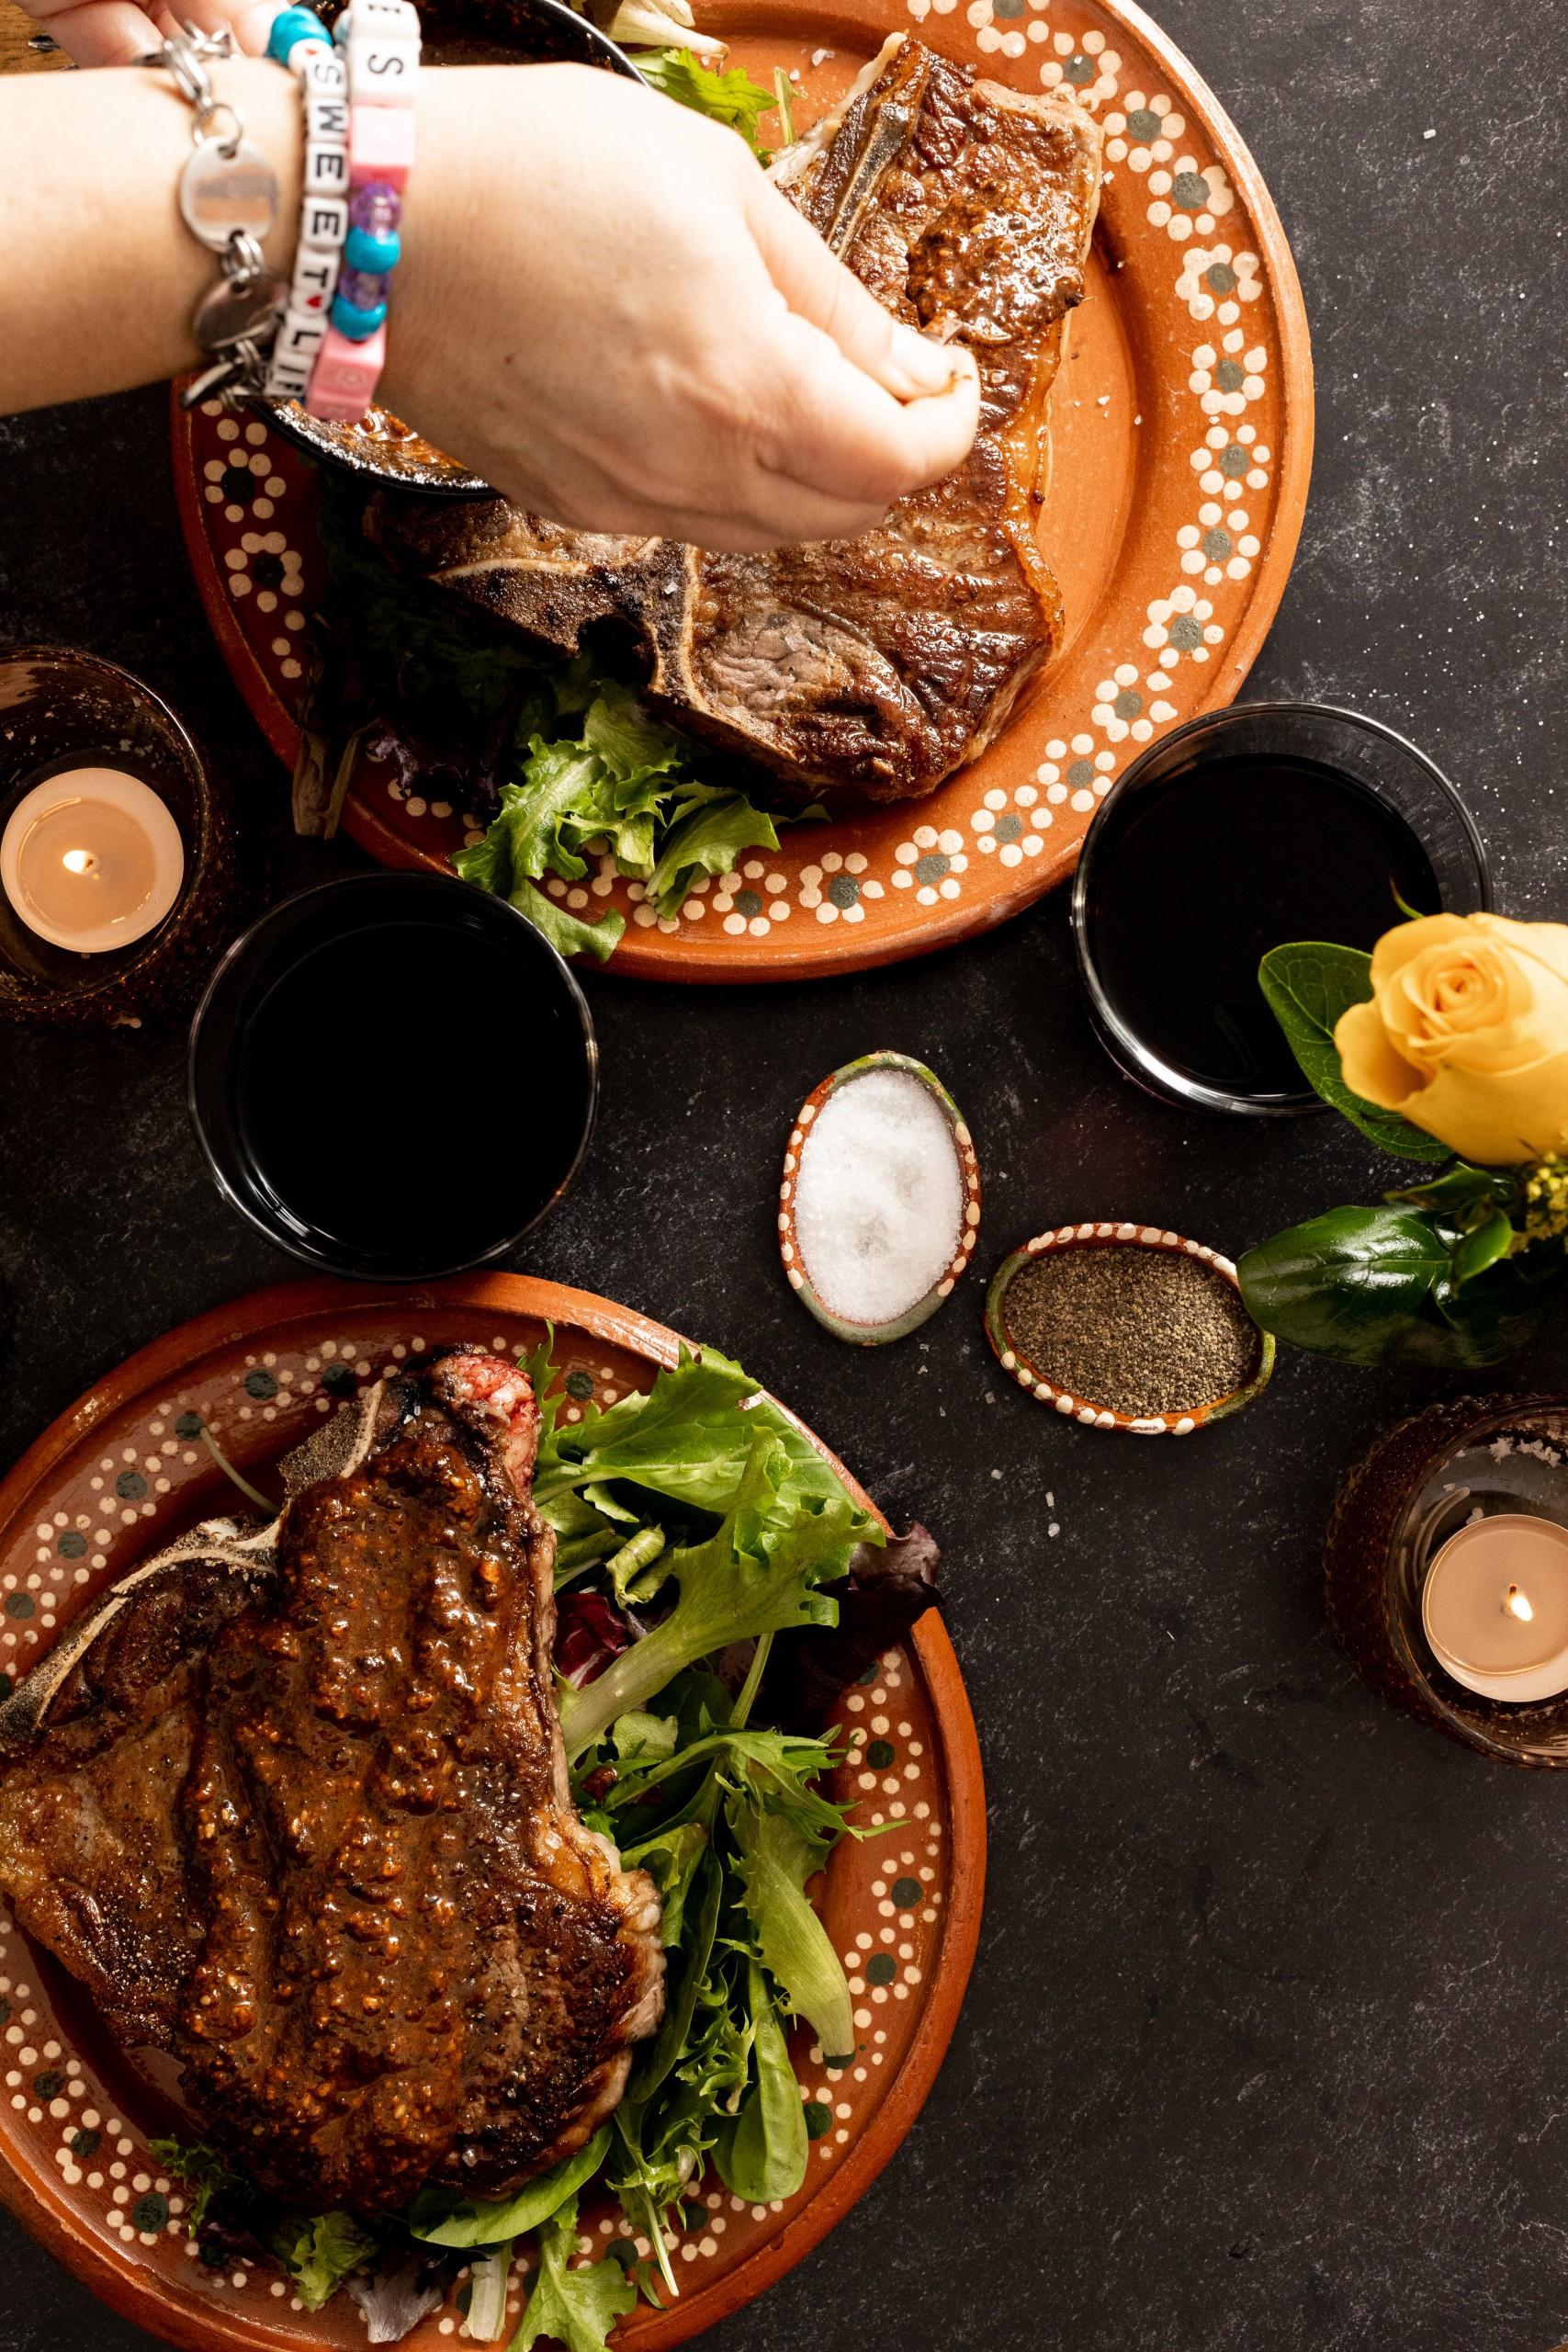 easy steak recipe for date night